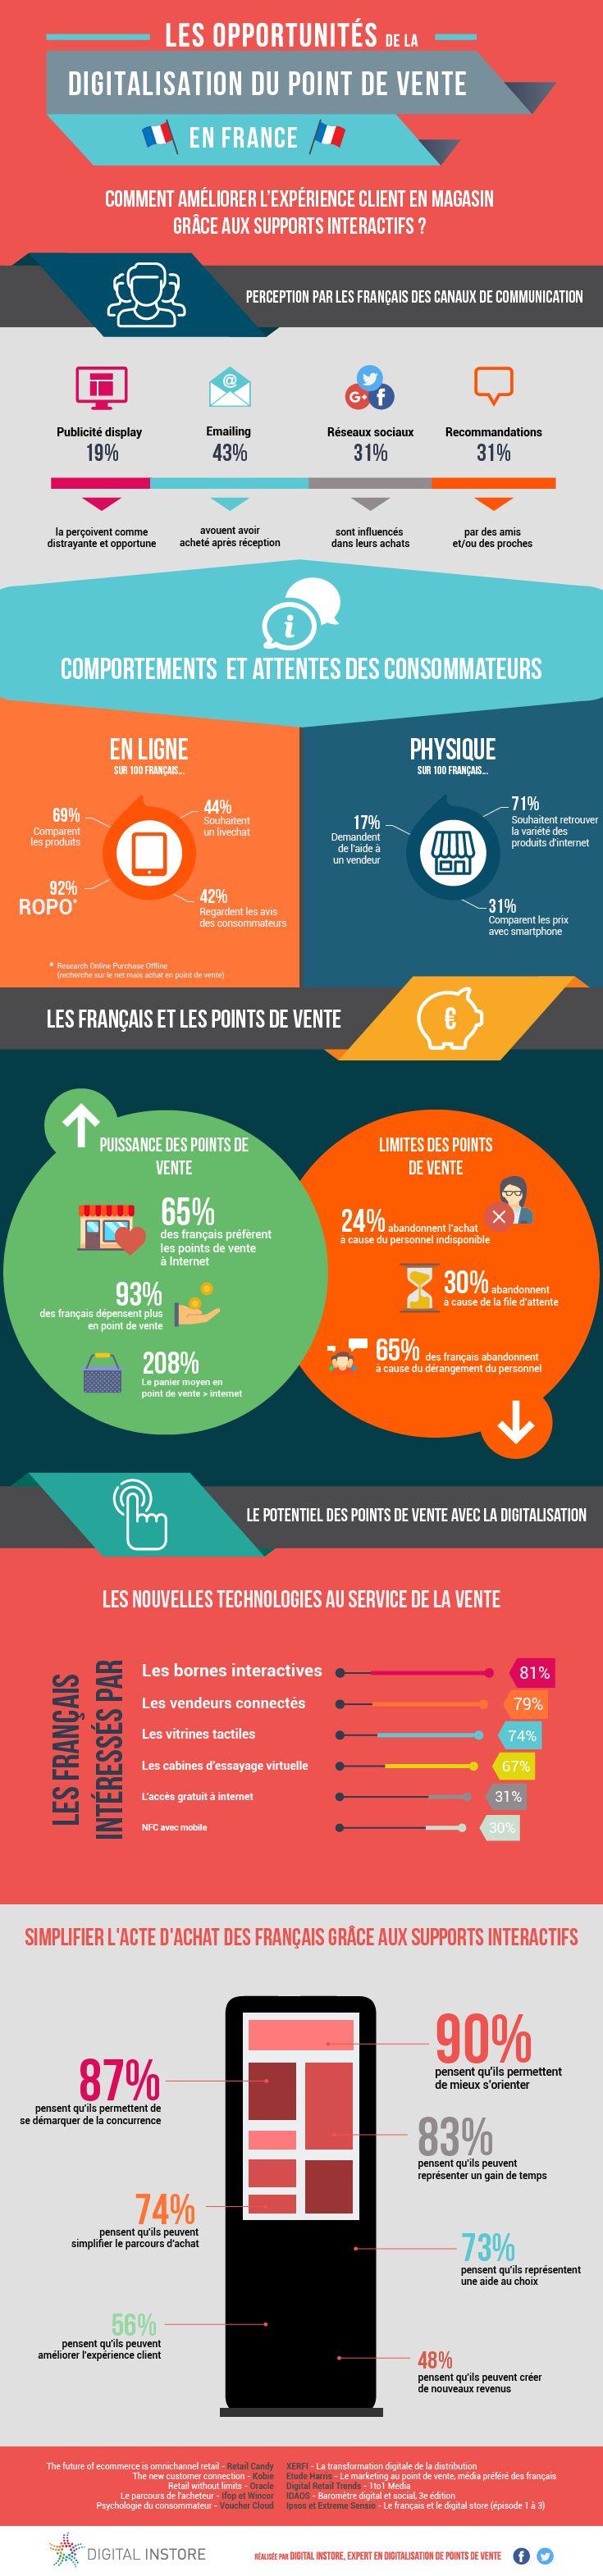 infographie-digitalisation-points-de-vente-en-france 2